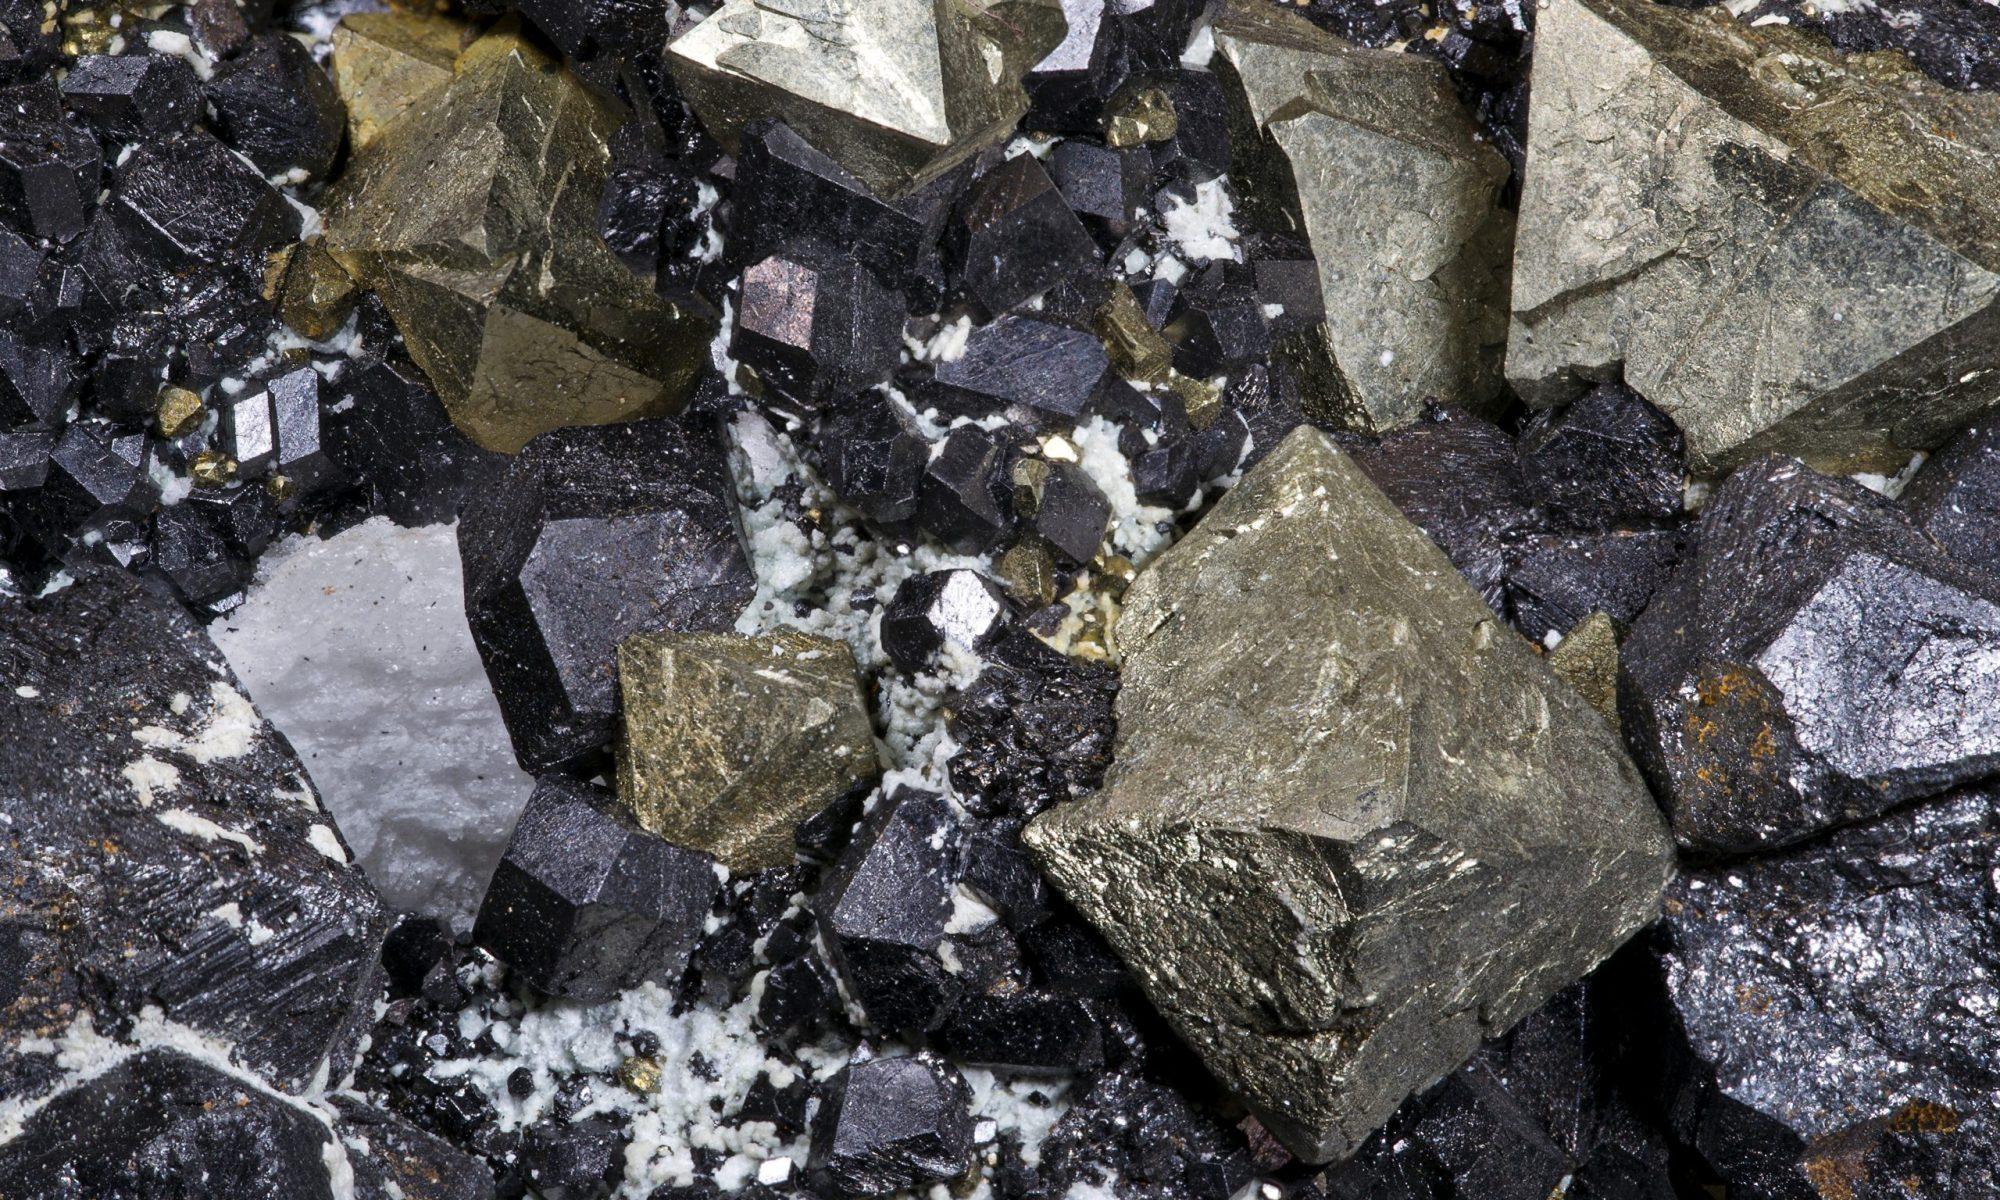 Jual Fe3O4 atau Besi(II,III) oksida Eceran dan Grosir